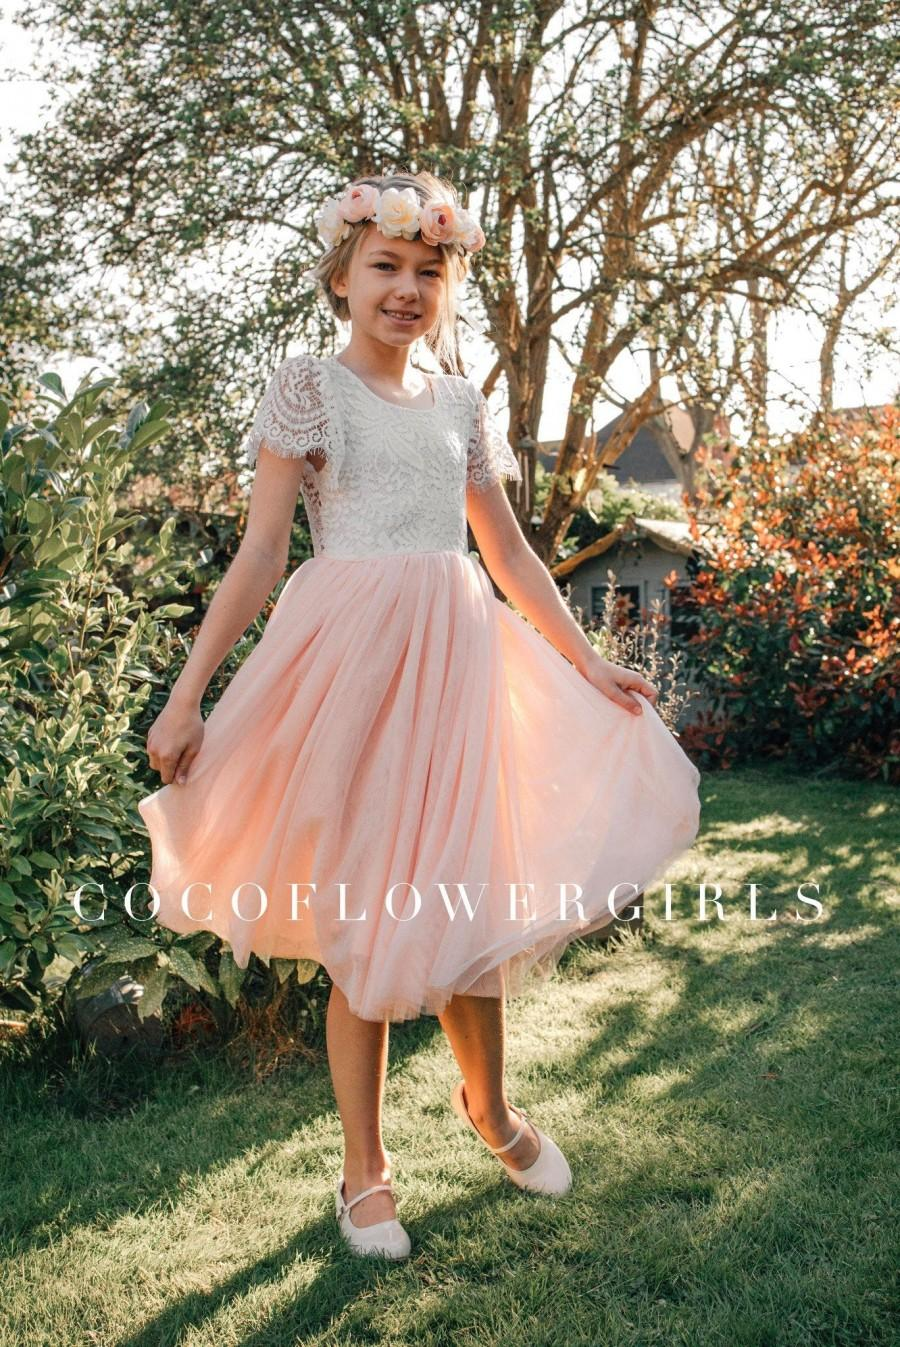 Hochzeit - Pretty Lace Flutter Sleeve Tea/Knee Length Blush Pink Peach Tulle Bohemian Rustic Hippie Style Flower Girl Dress